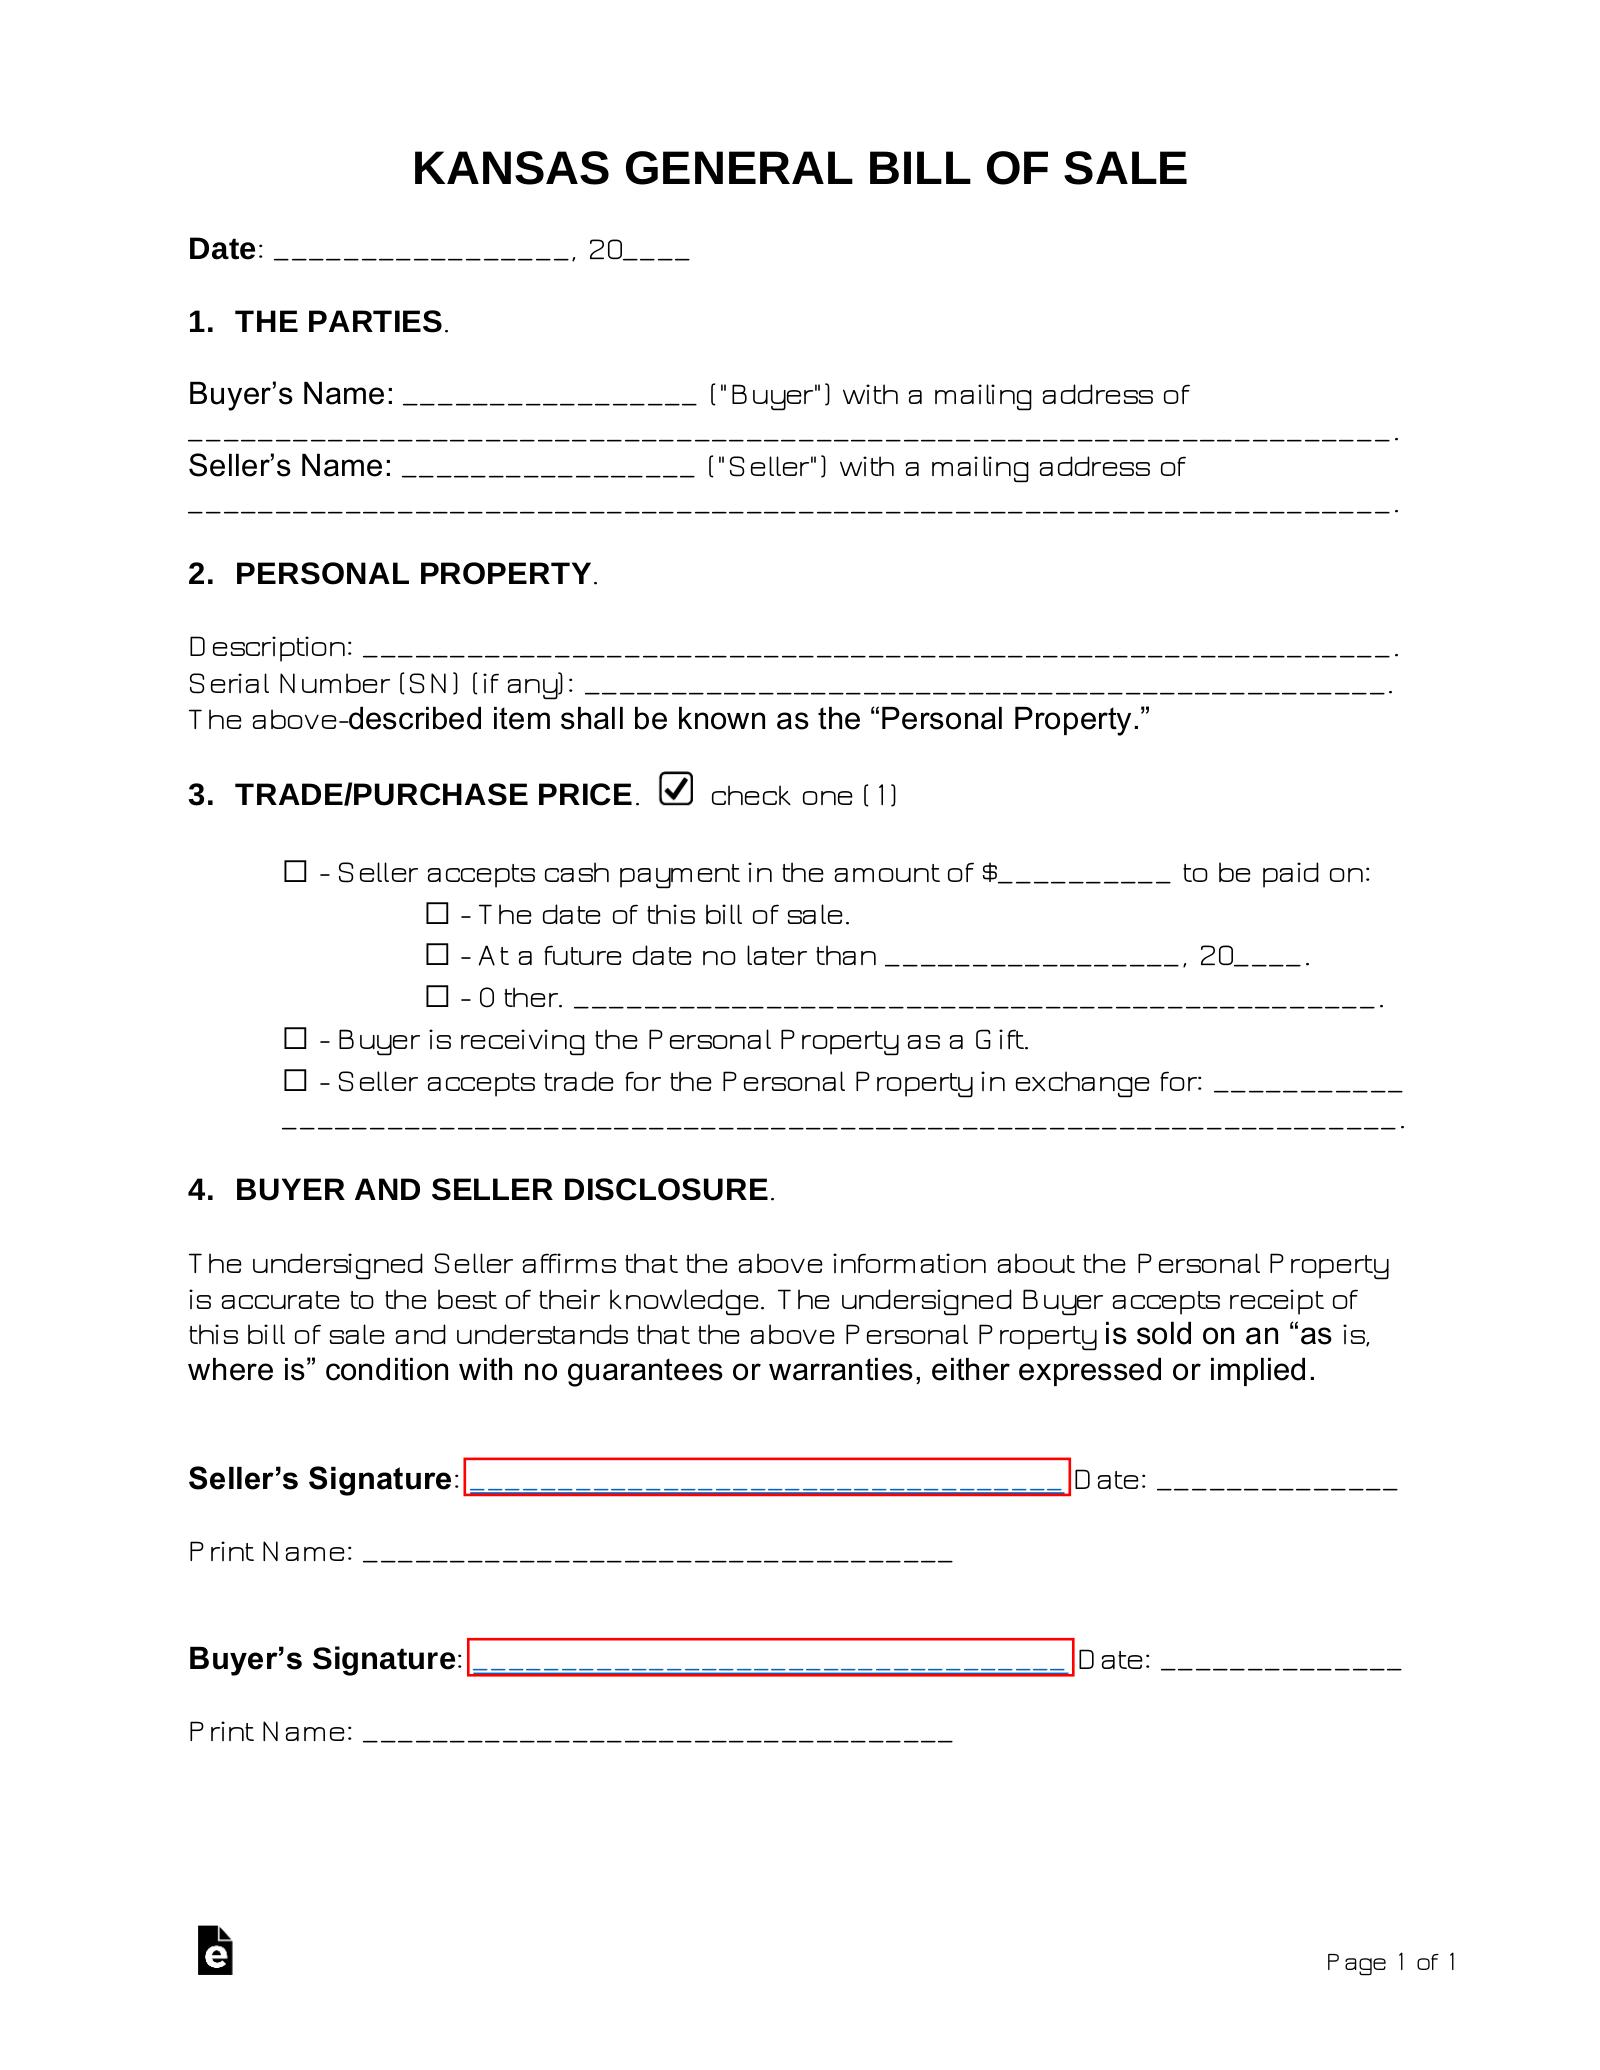 Free Kansas General Bill Of Sale Form